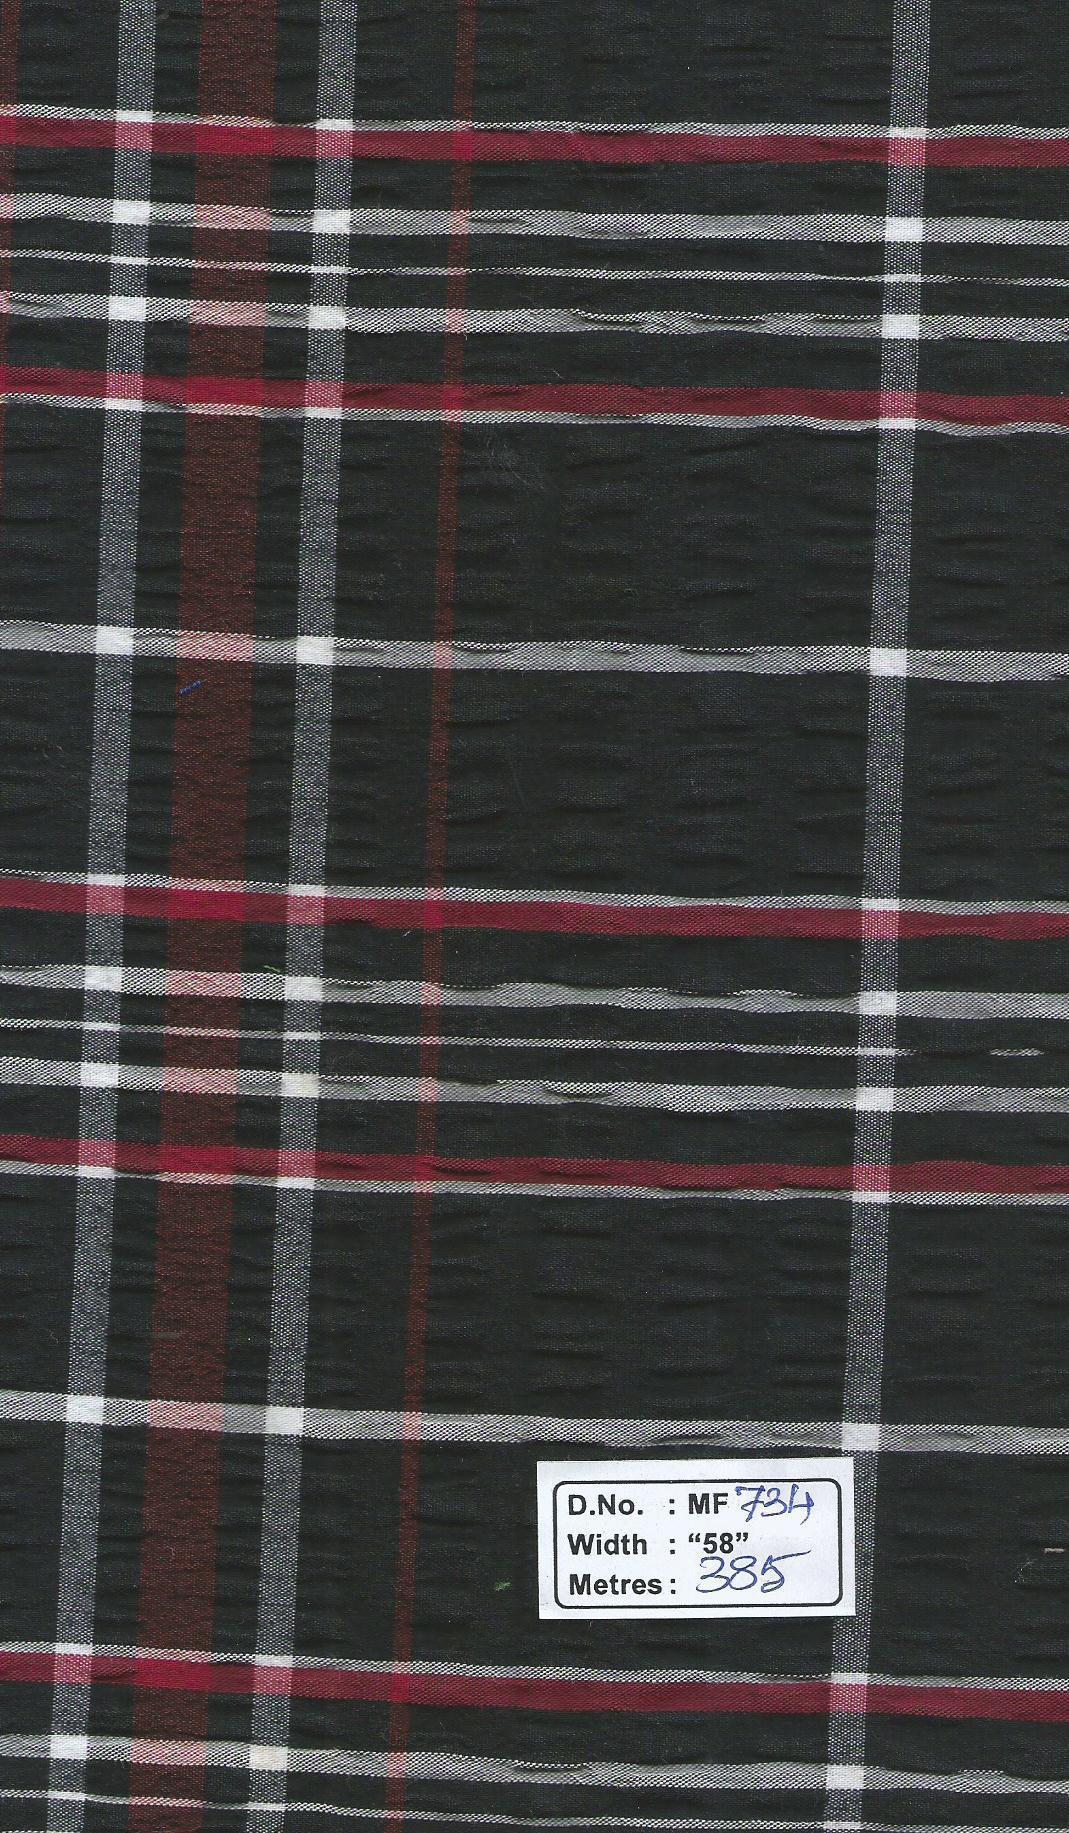 seersucker 100% cotton fabrics